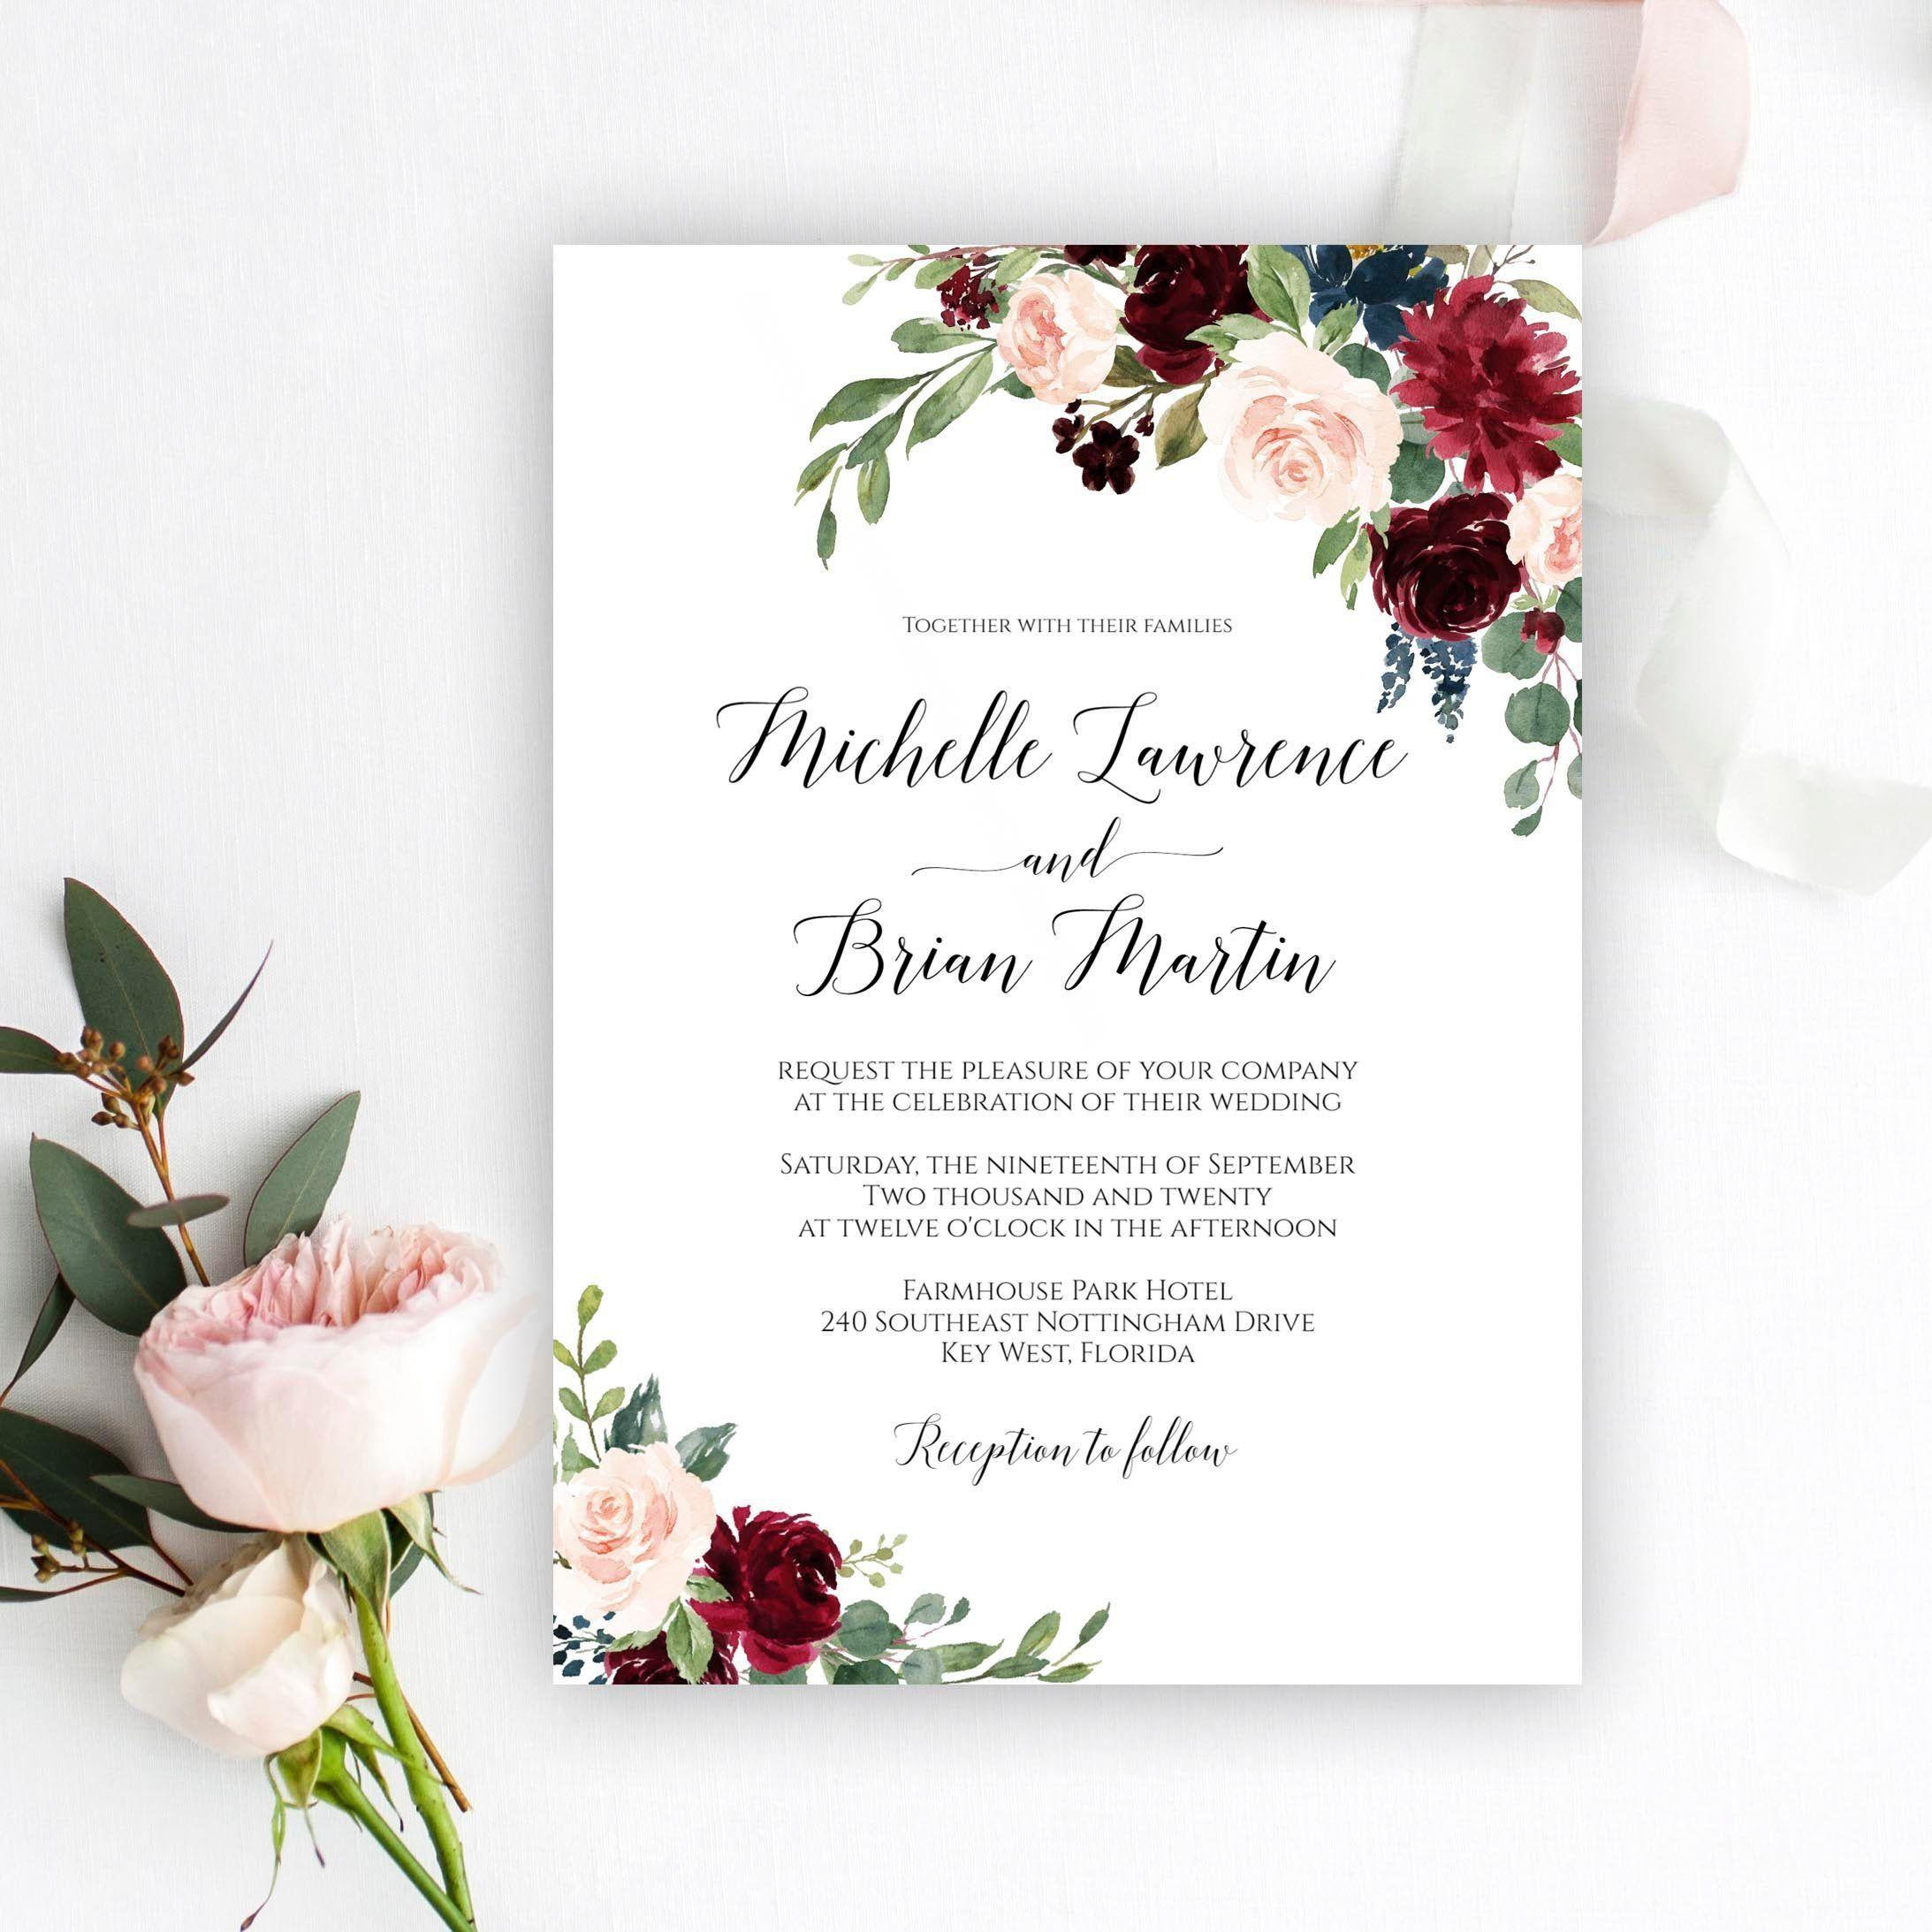 009 Fearsome Microsoft Word Wedding Invitation Template Free Download High Resolution  M EditableFull